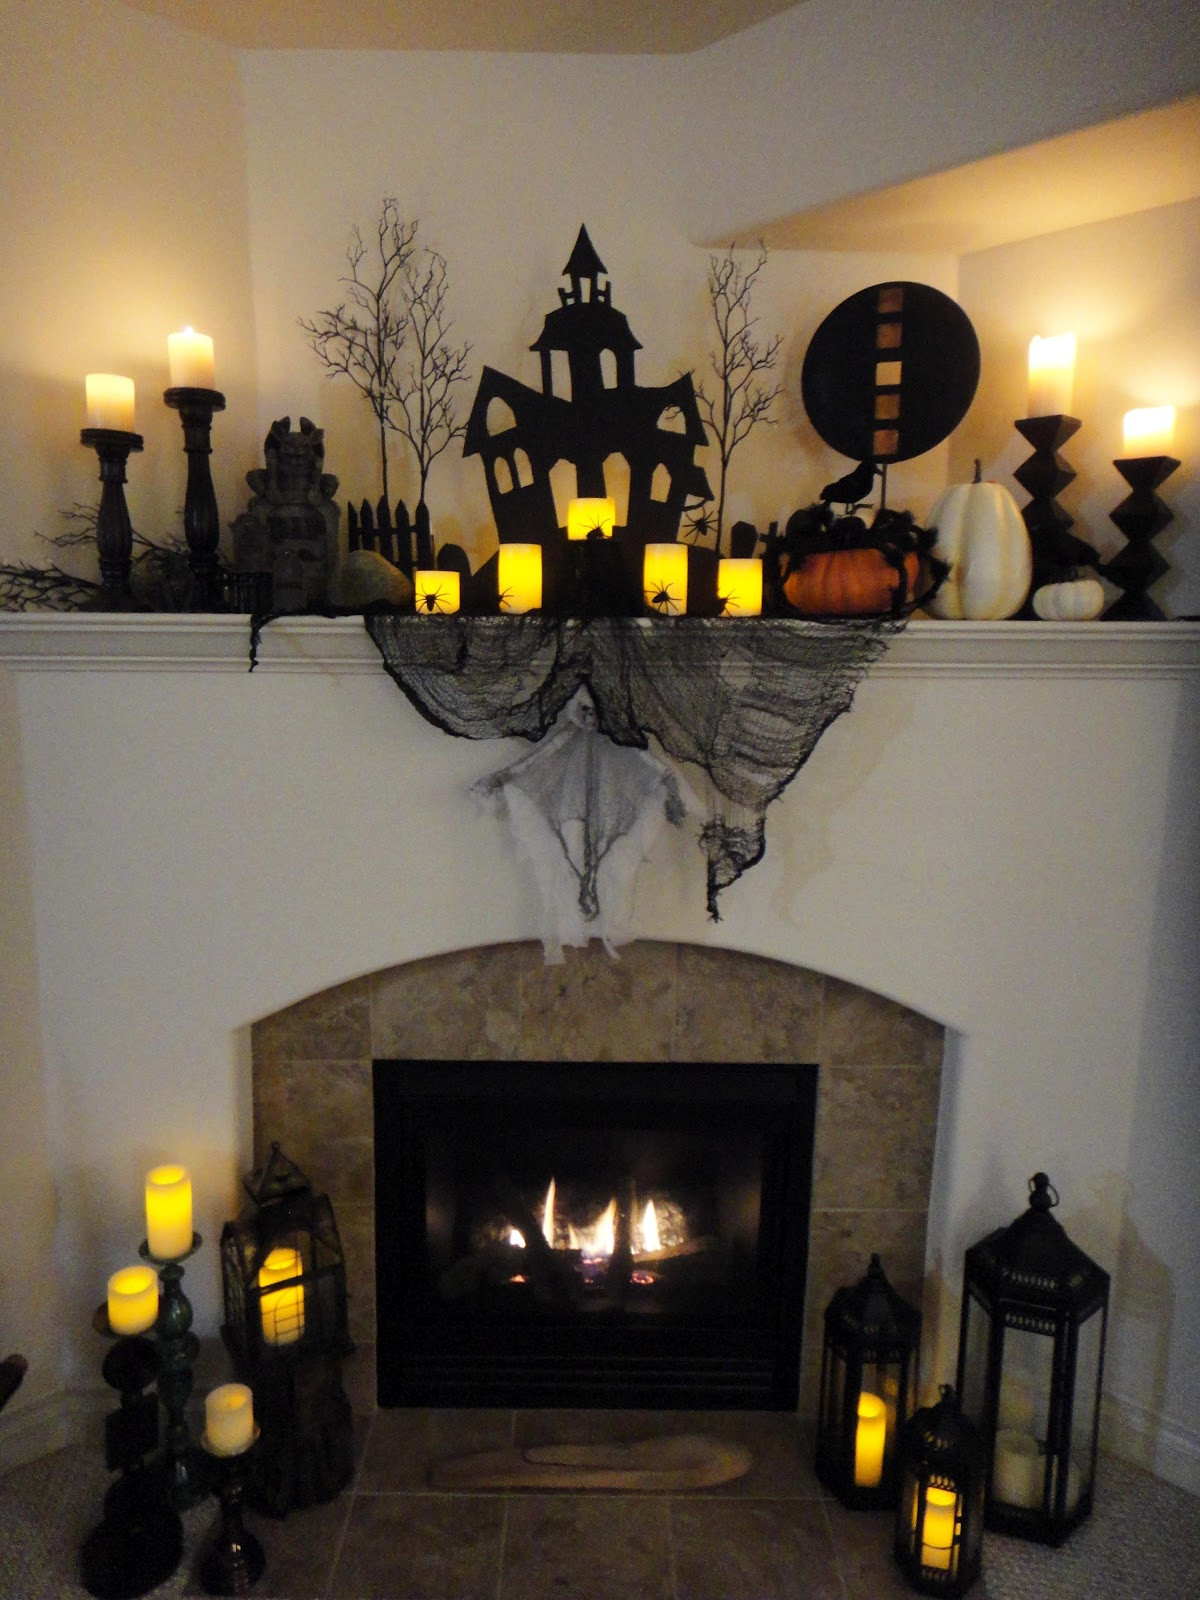 Halloween Fireplace Decorations  Worth Pinning Spooky Halloween Mantel